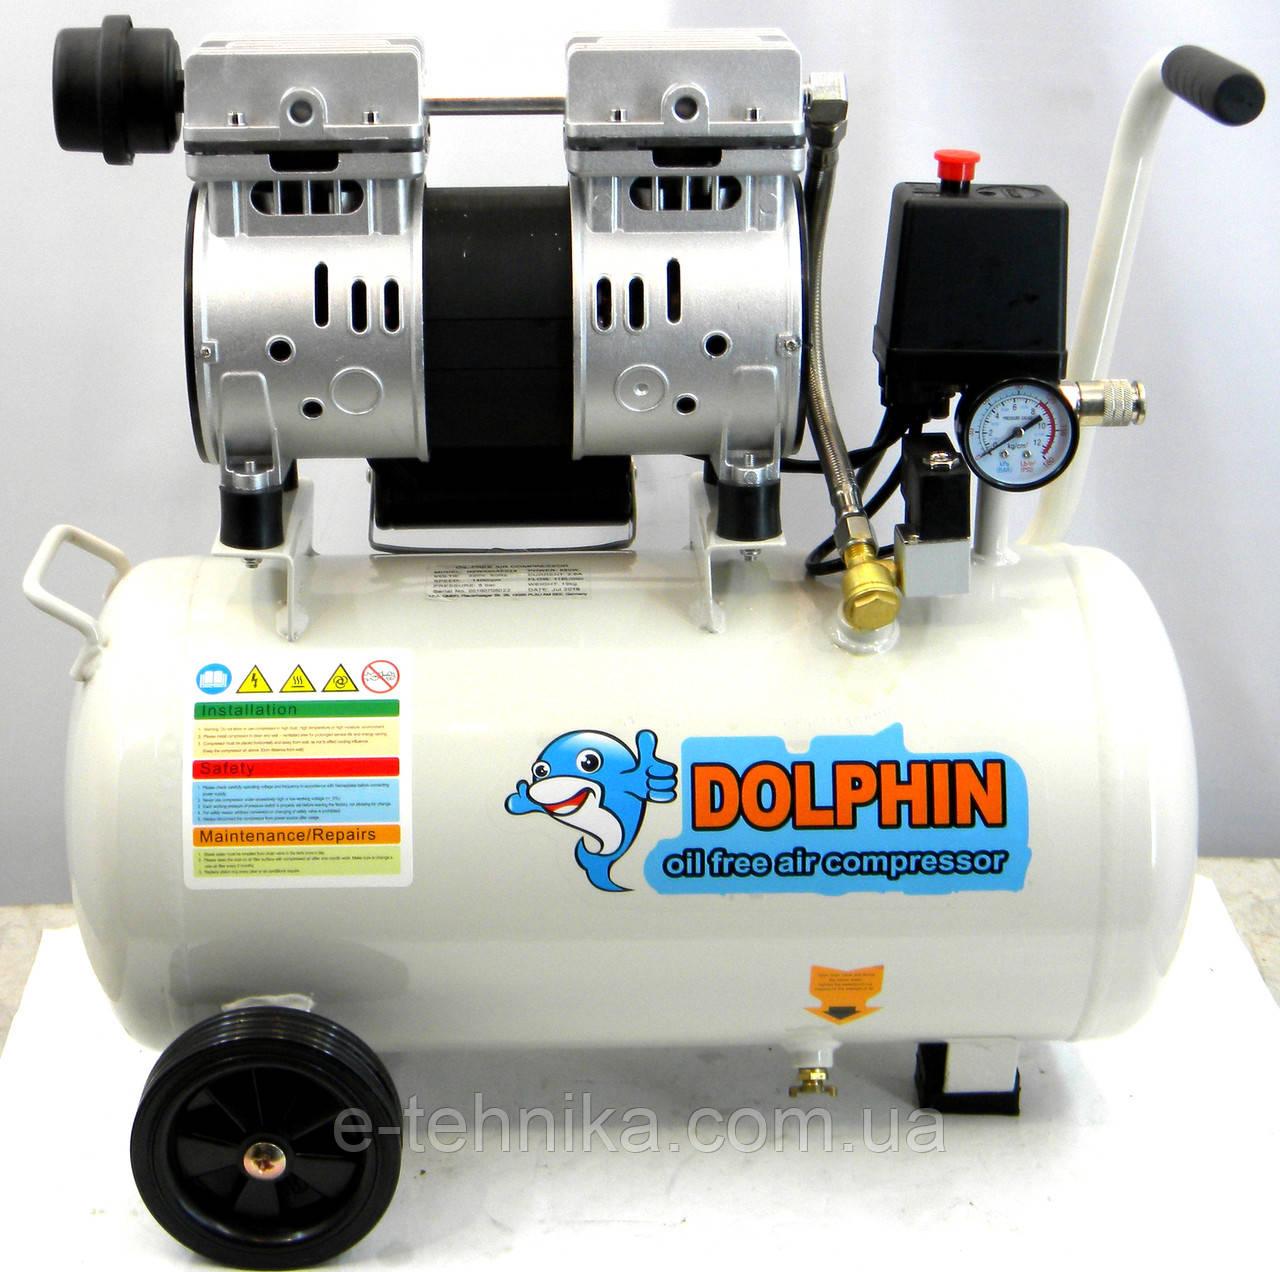 Компрессор безмасляный Dolphin DZW550AF024